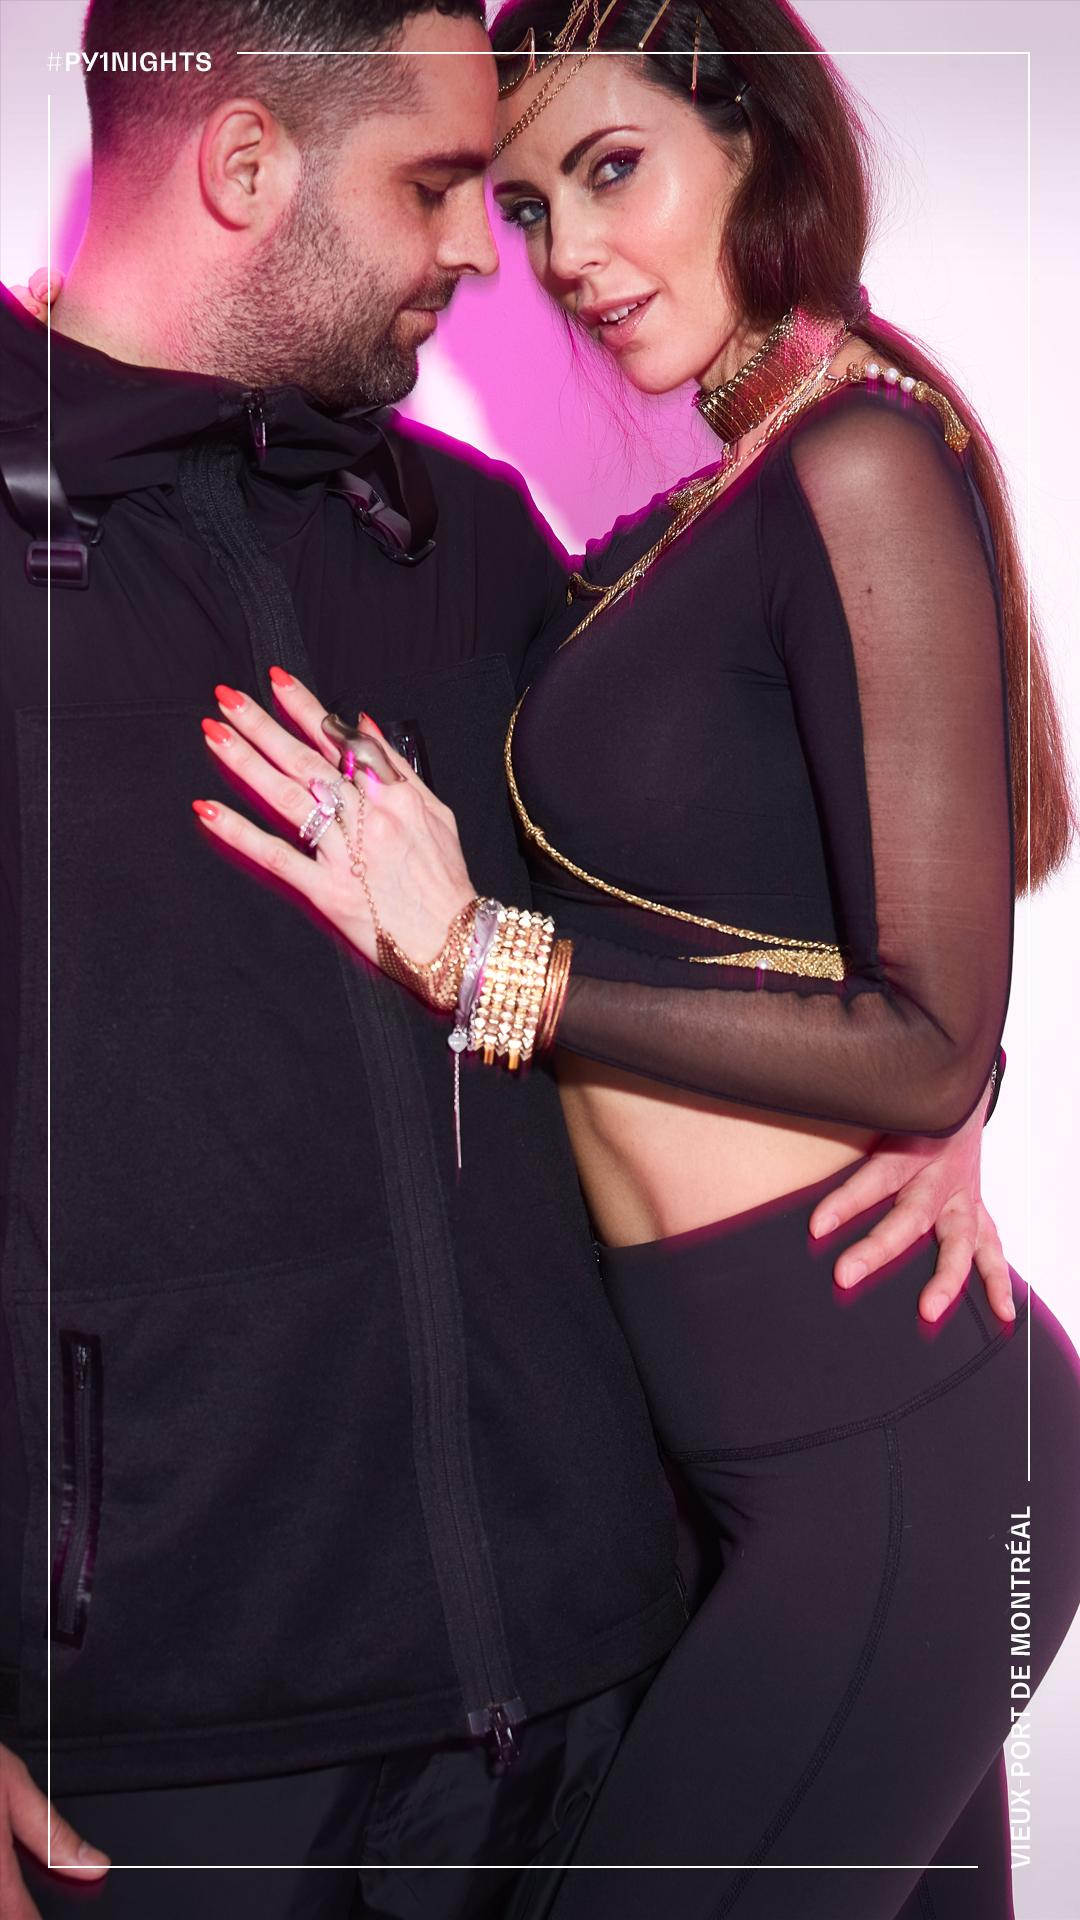 alex brosseau and jasmine.jpg